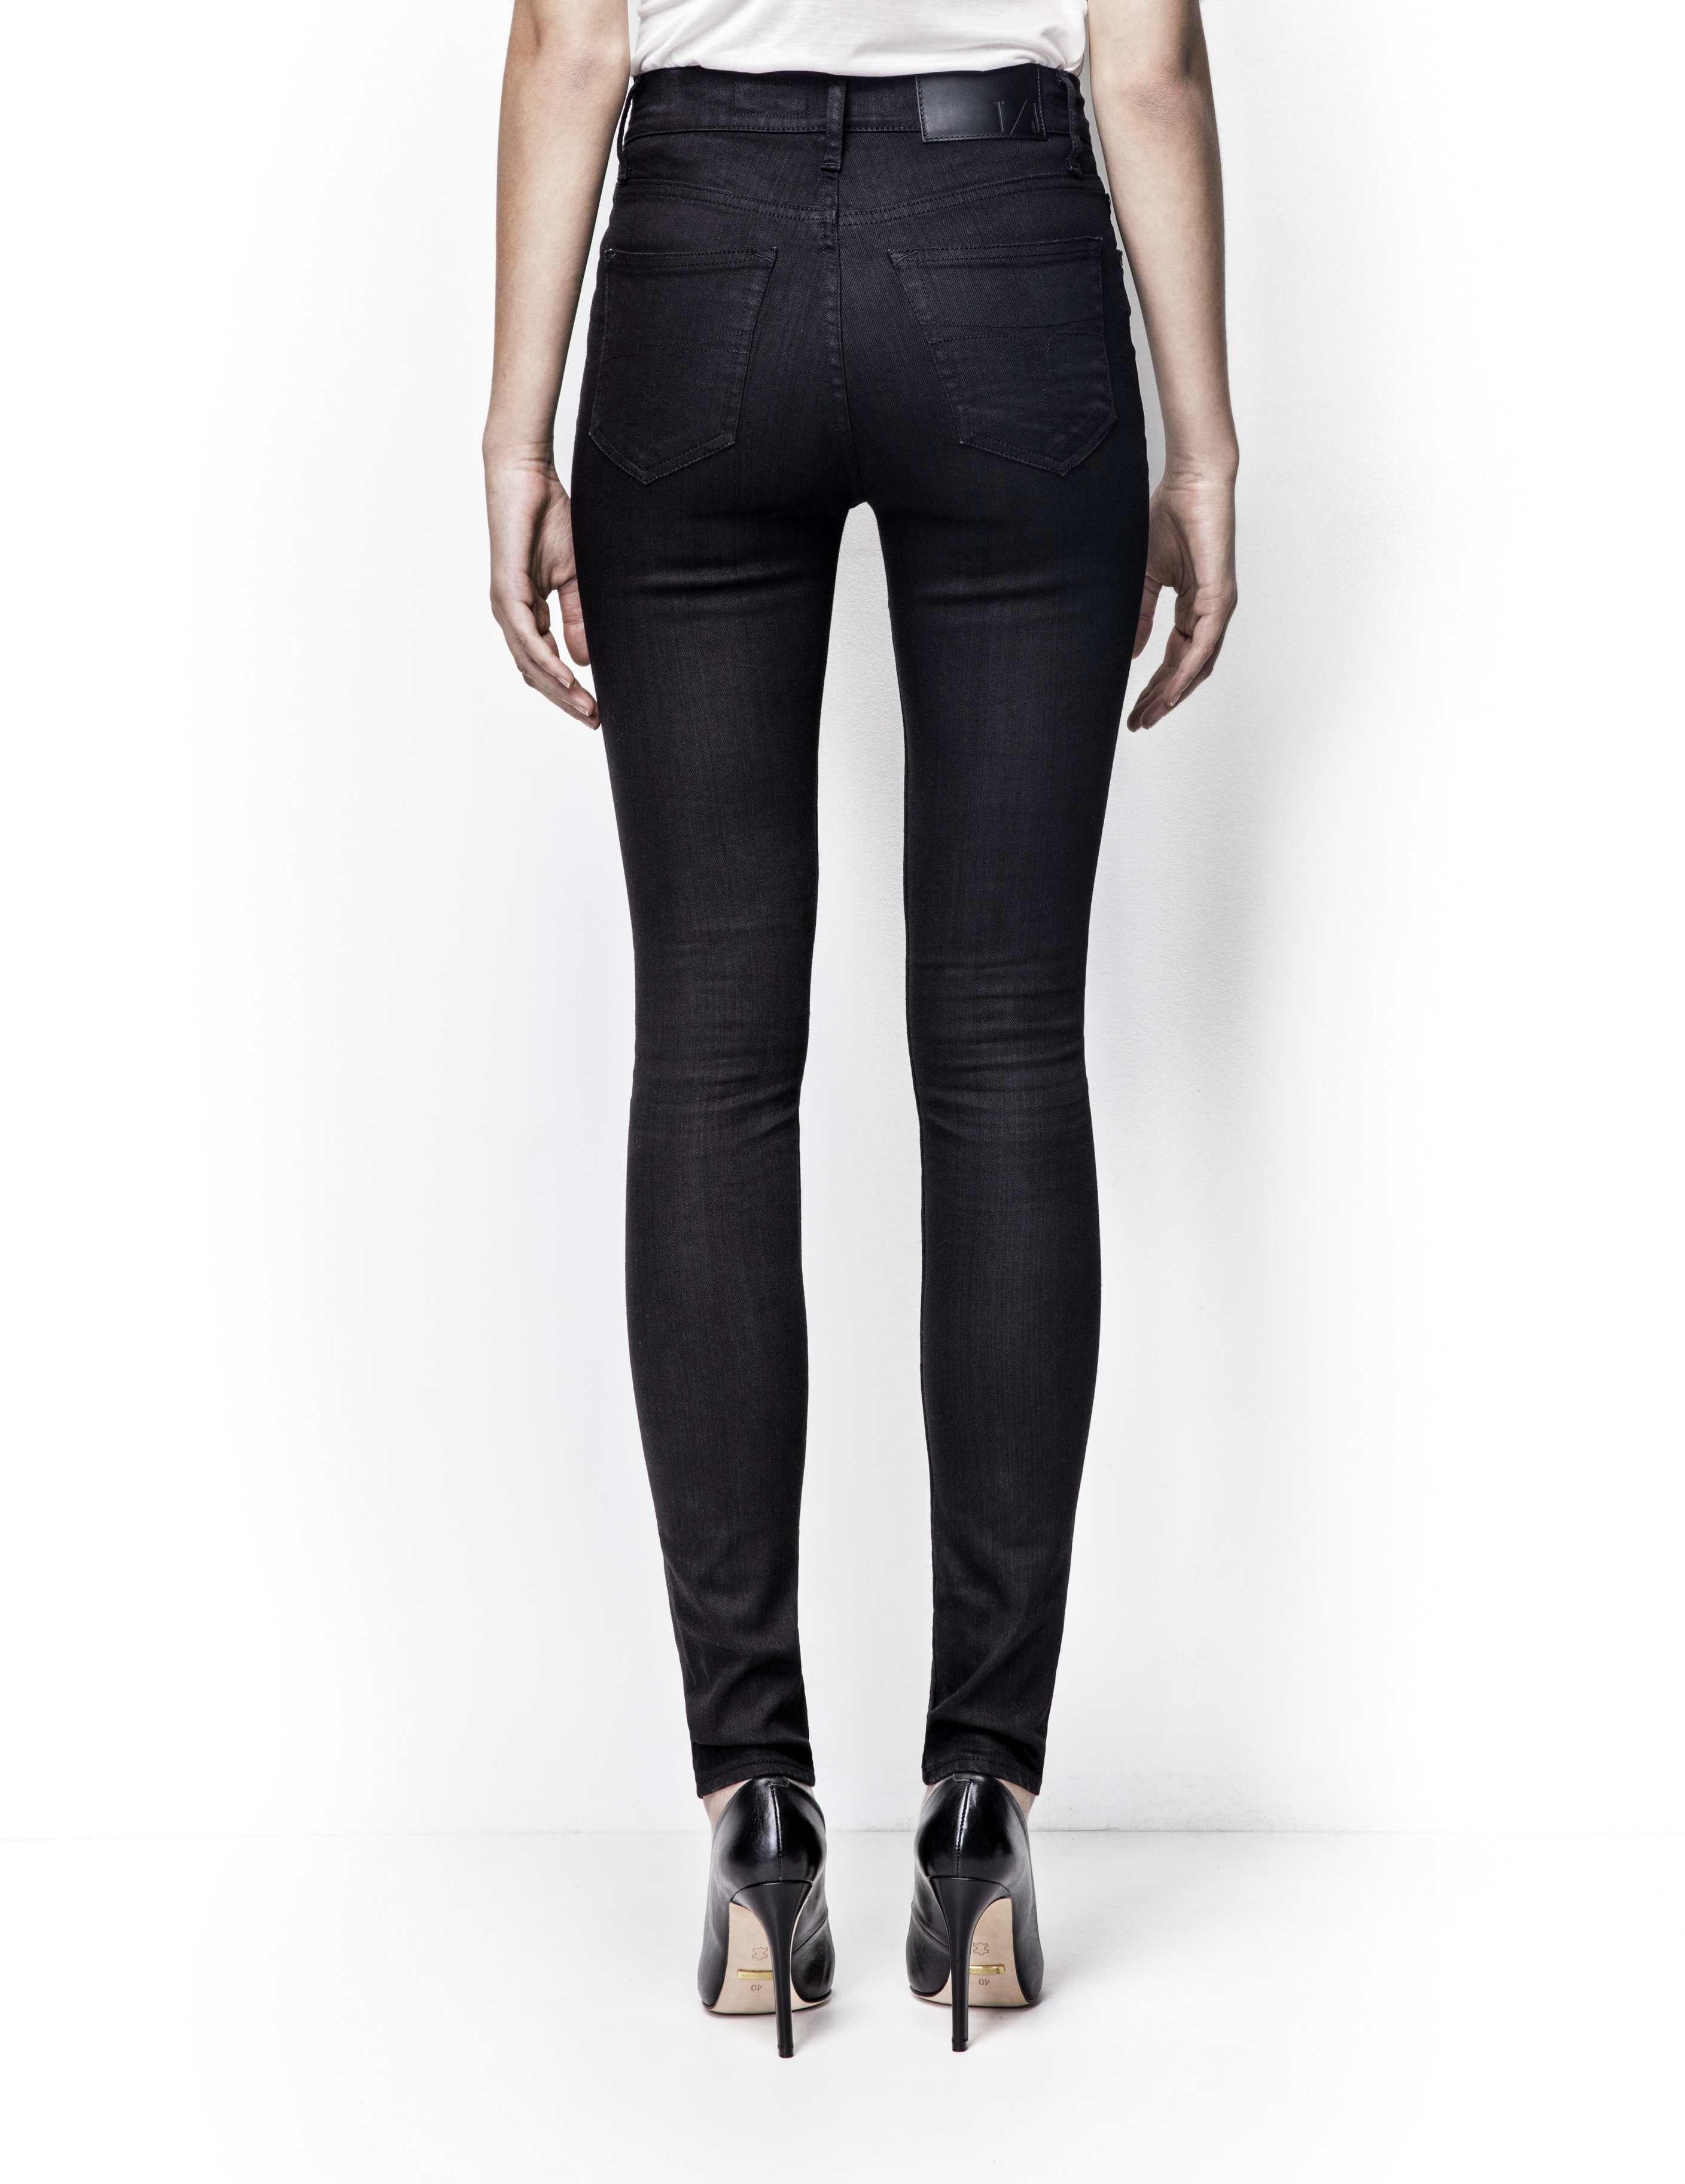 Women's Black Of Kelly Jeans Waist Sweden Super Tiger High Jeans qAgwfaqX